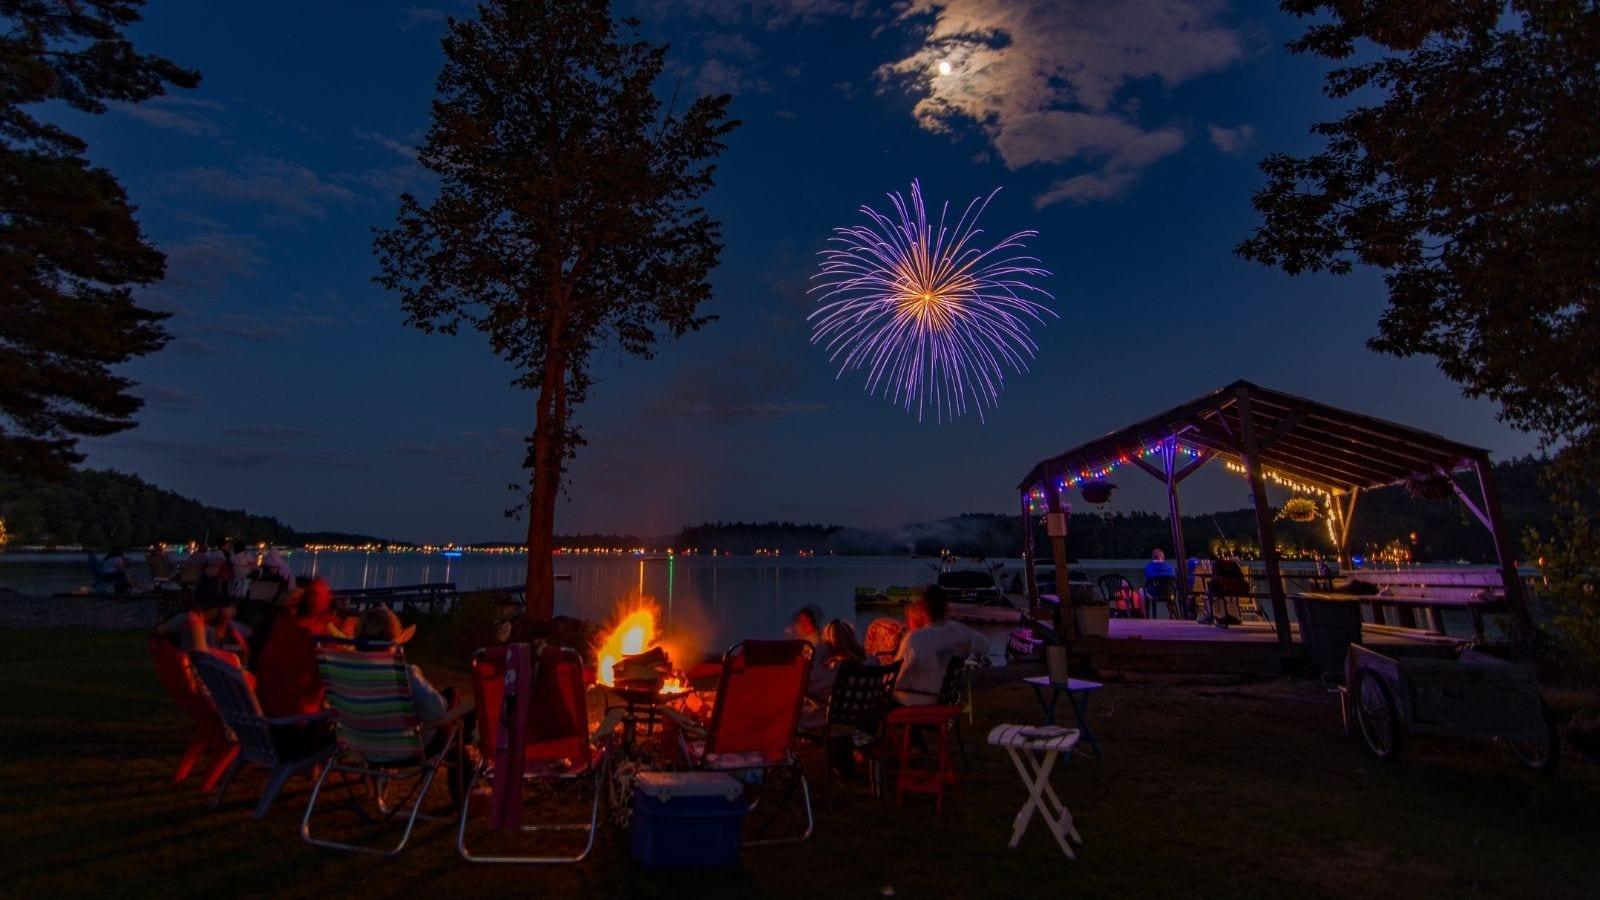 Fireworks over Lakke Winnipesaukee, New Hampshire (Photo: @northbound9999 via Twenty20)